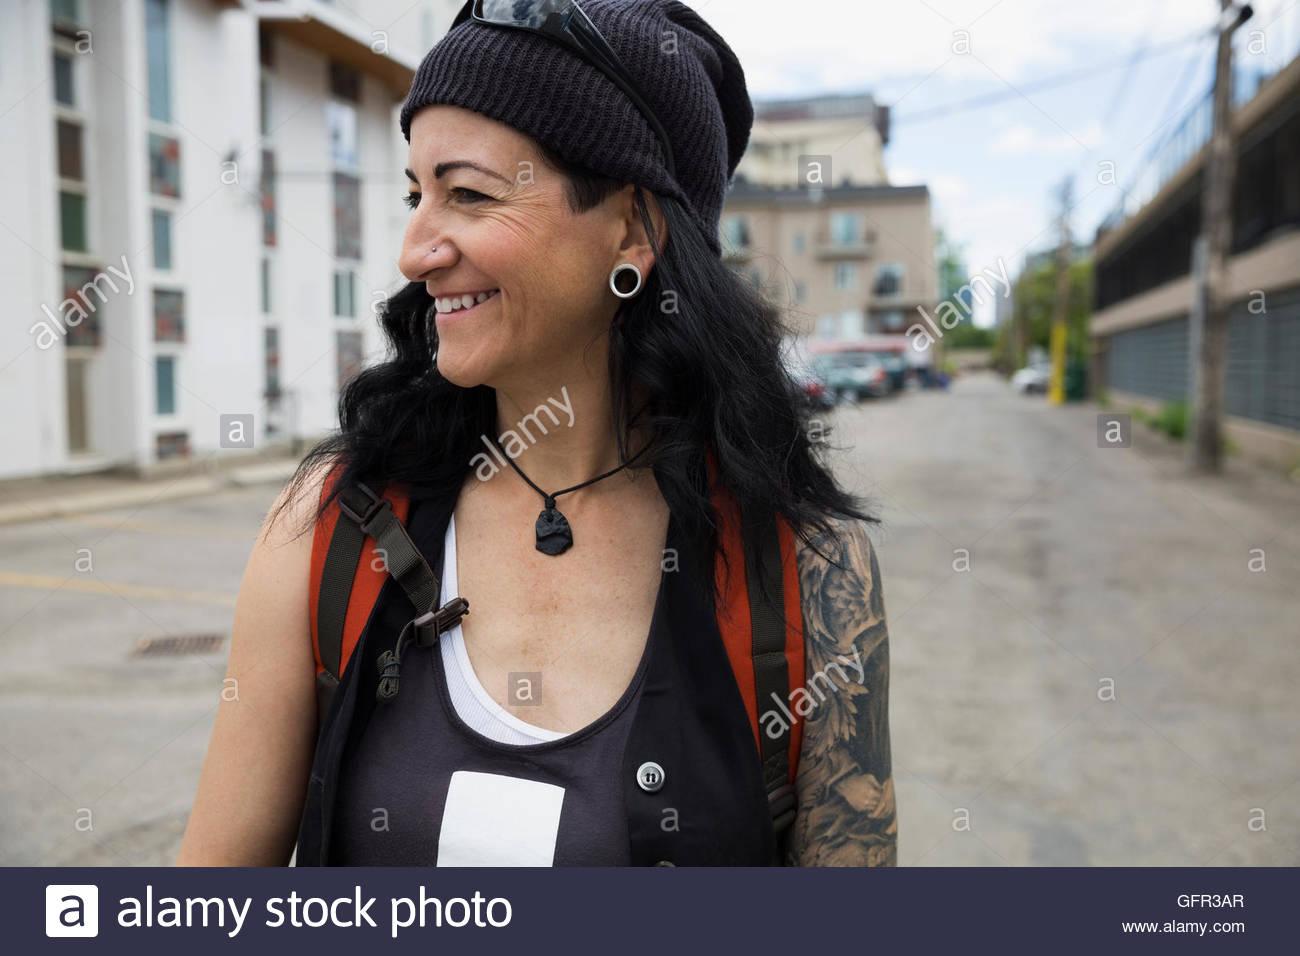 Coole Reife Frau lächelnd in urbane Gasse Stockbild